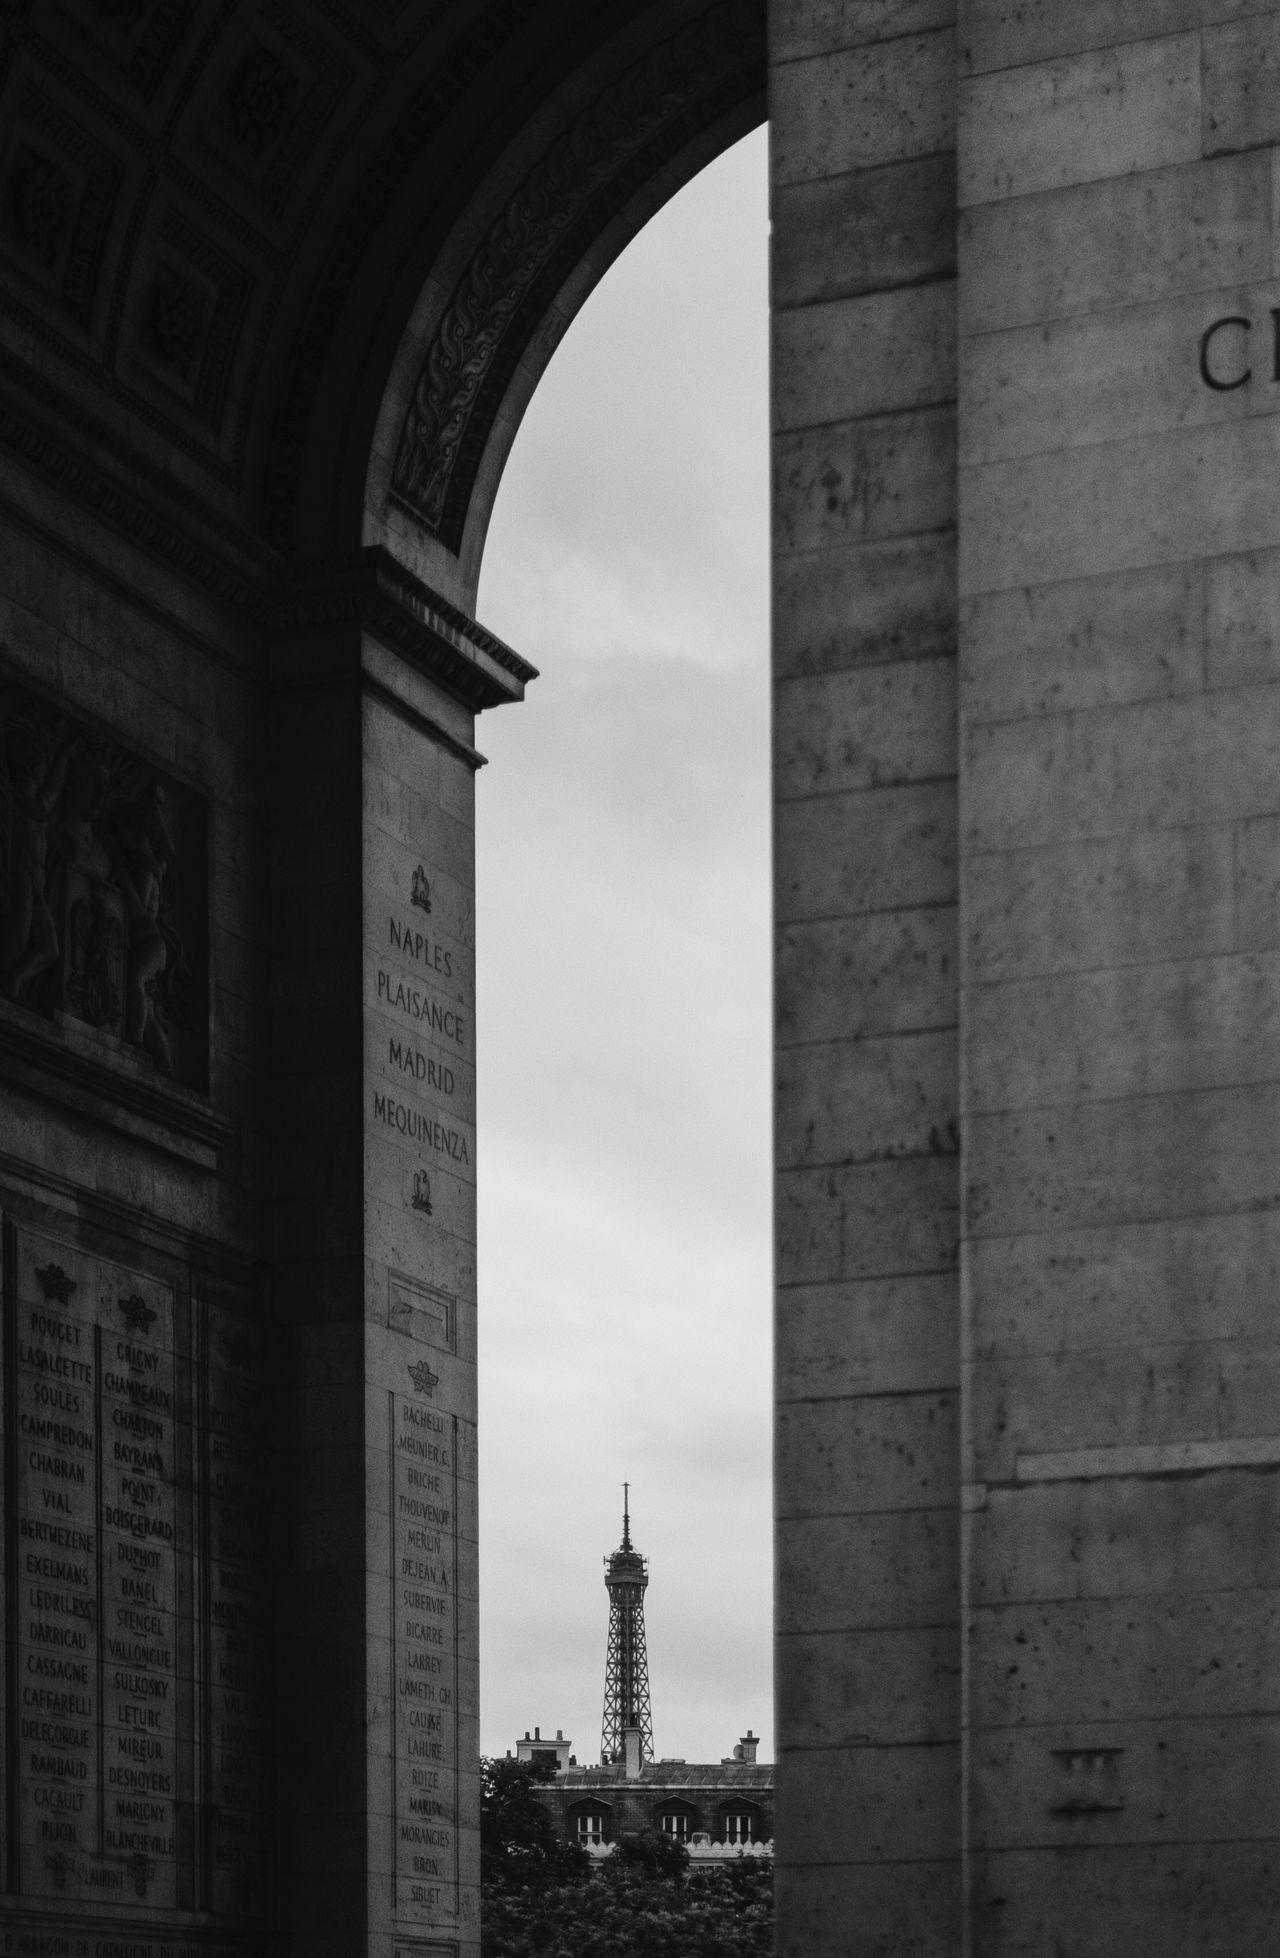 Architectural Column Architecture Building Exterior Built Structure Champ Élysées City Day Eiffel Tower France History No People Outdoors Paris Paris, France  Sky Statue Travel Travel Travel Destinations